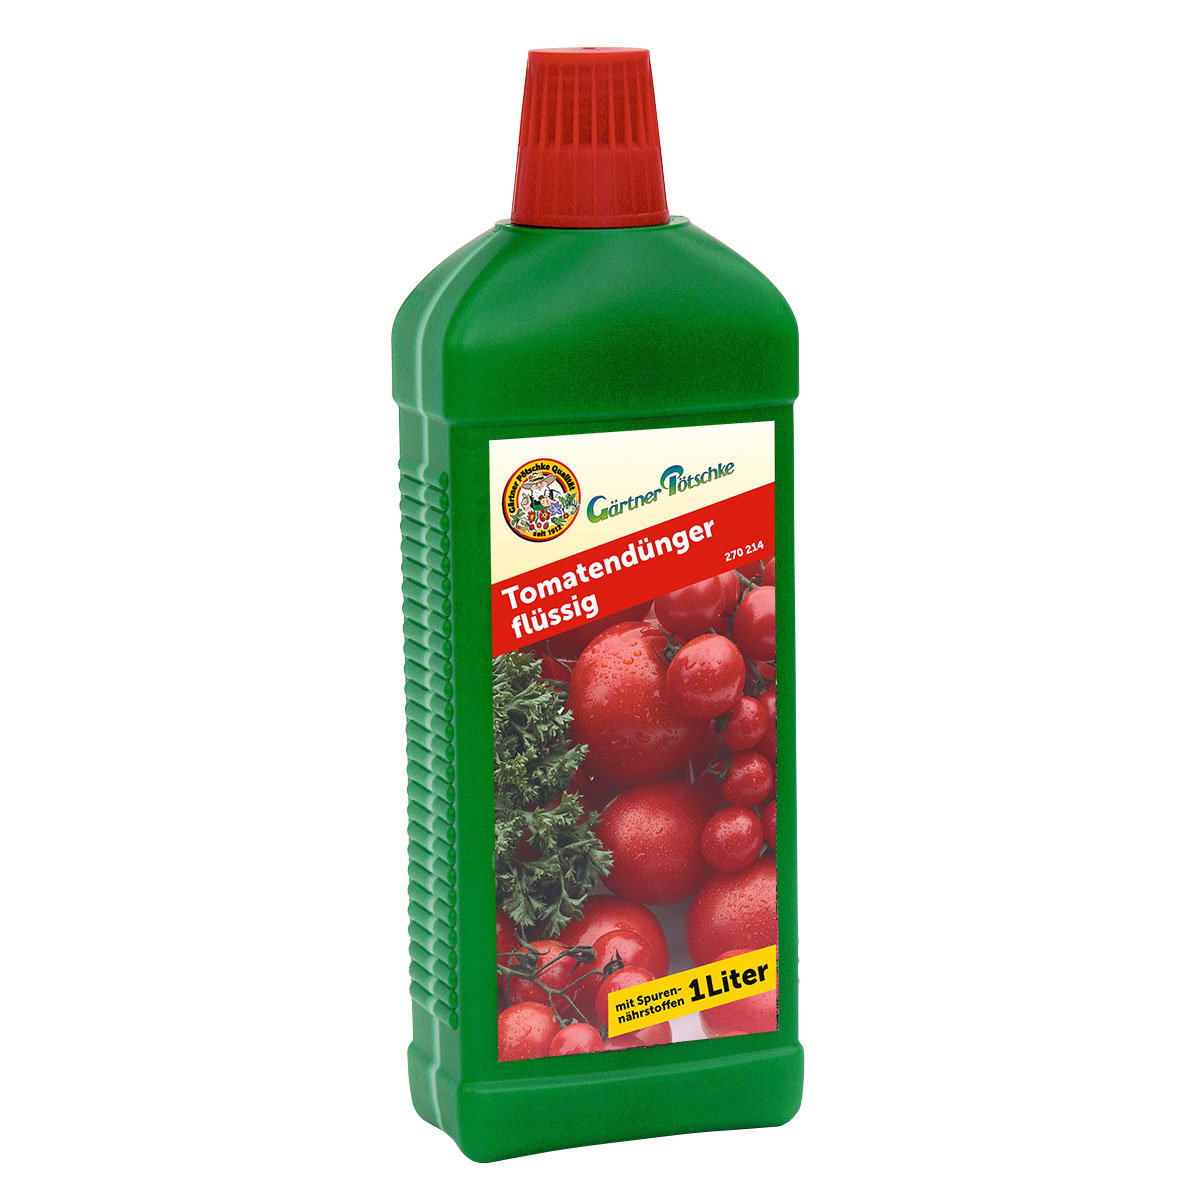 Tomatendünger flüssig, 1 Liter